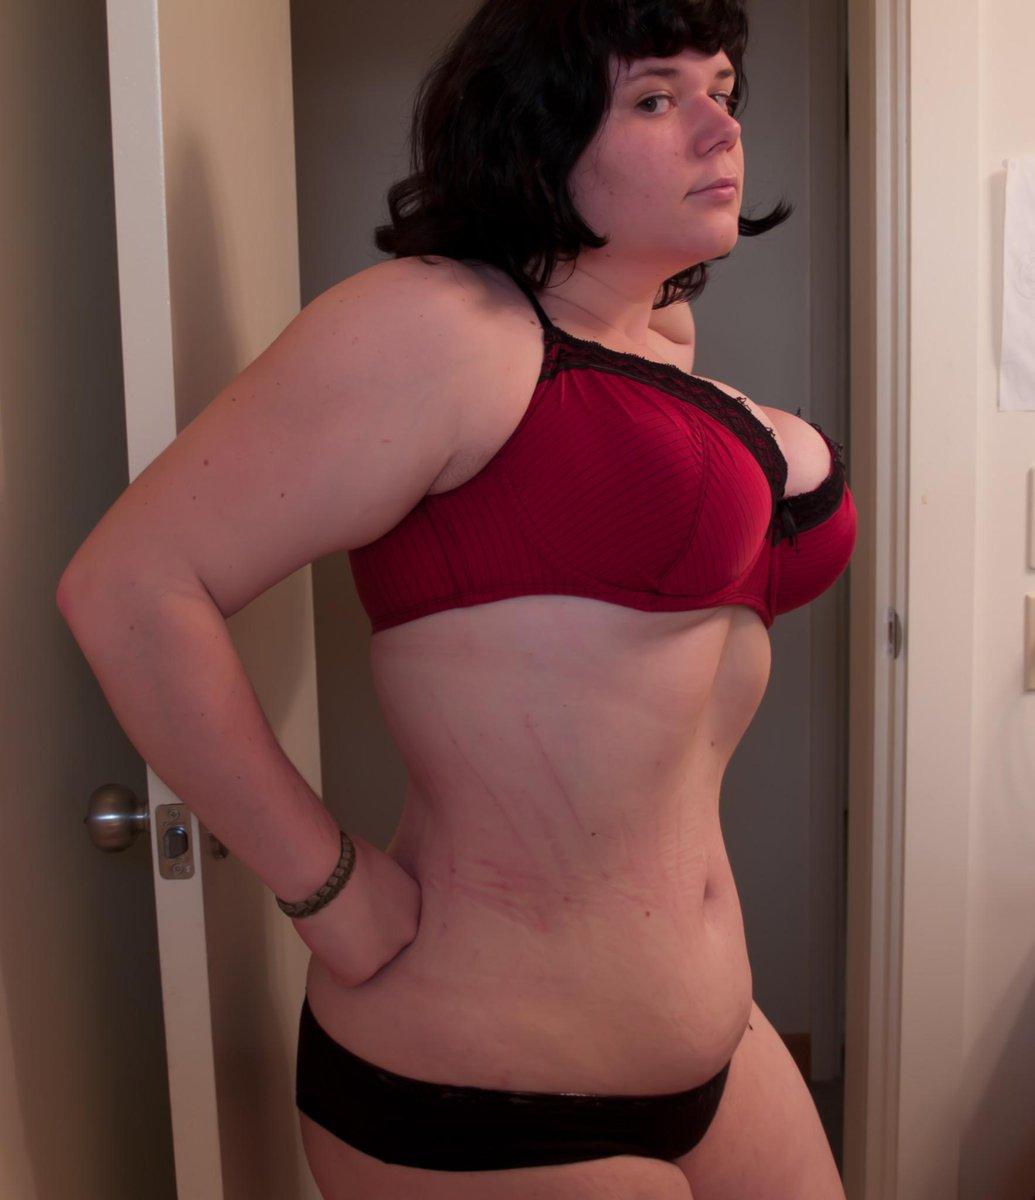 "A W Porn Star eroticphotographyuk on twitter: ""@bigbraman @penny_underbust"